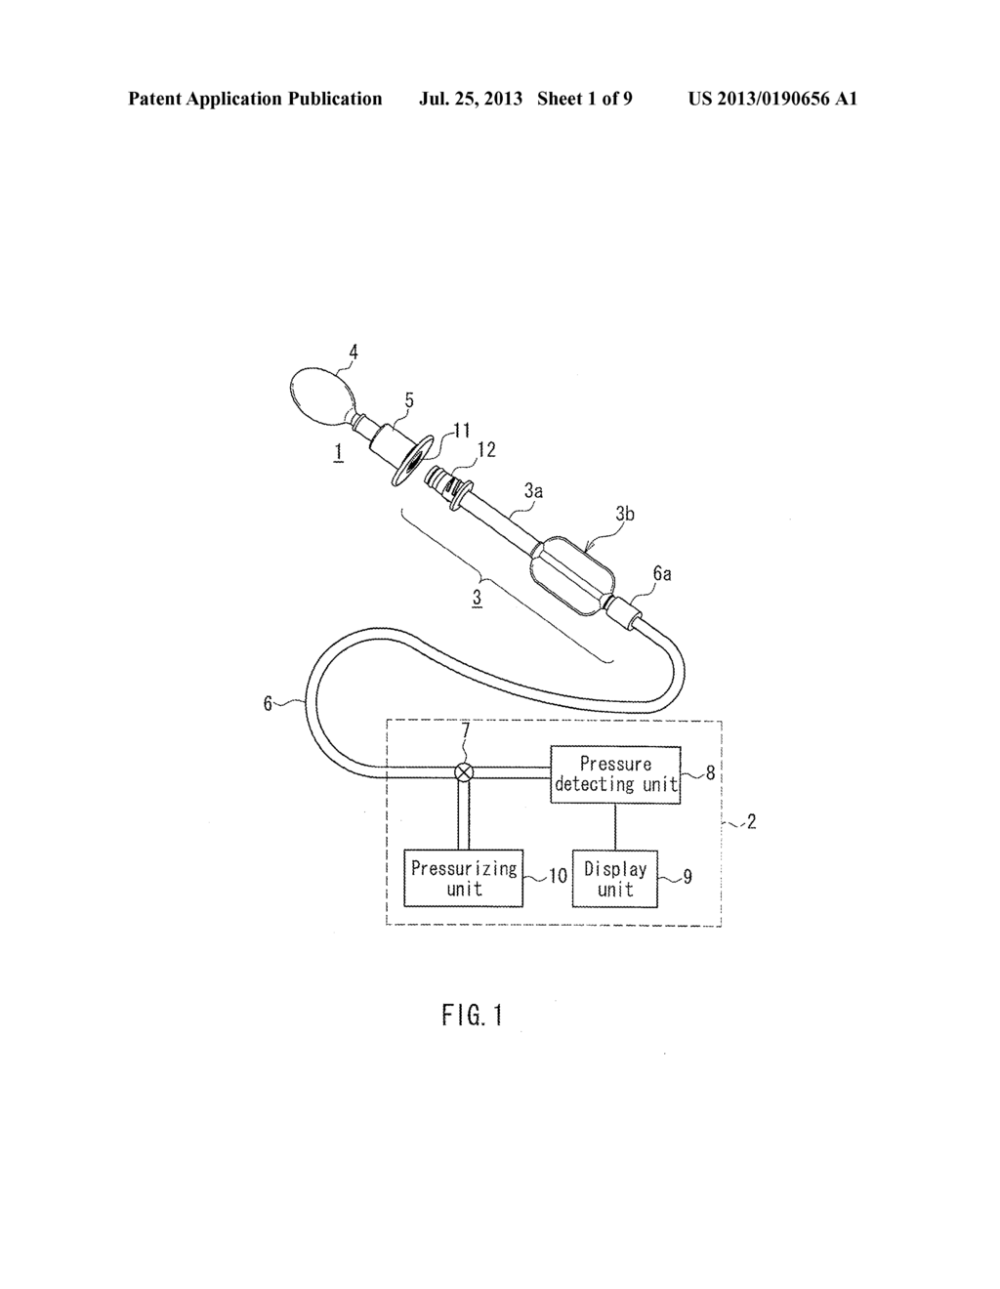 medium resolution of device for measuring oral cavity pressure pressure measuring probe diagram schematic and image 02